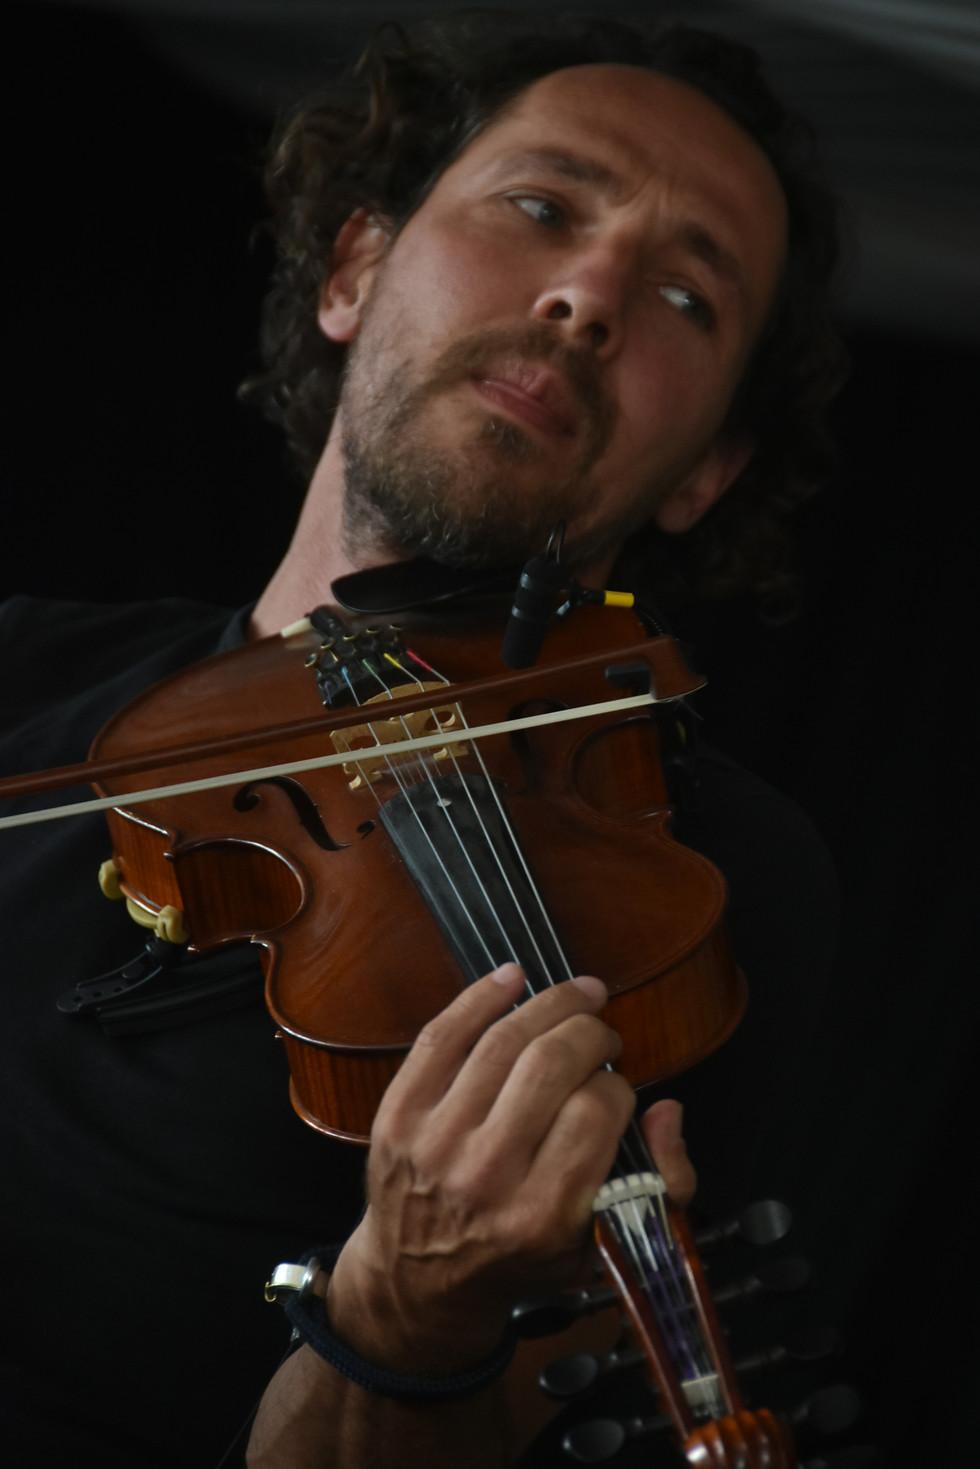 Edwin Vanvinckenroye